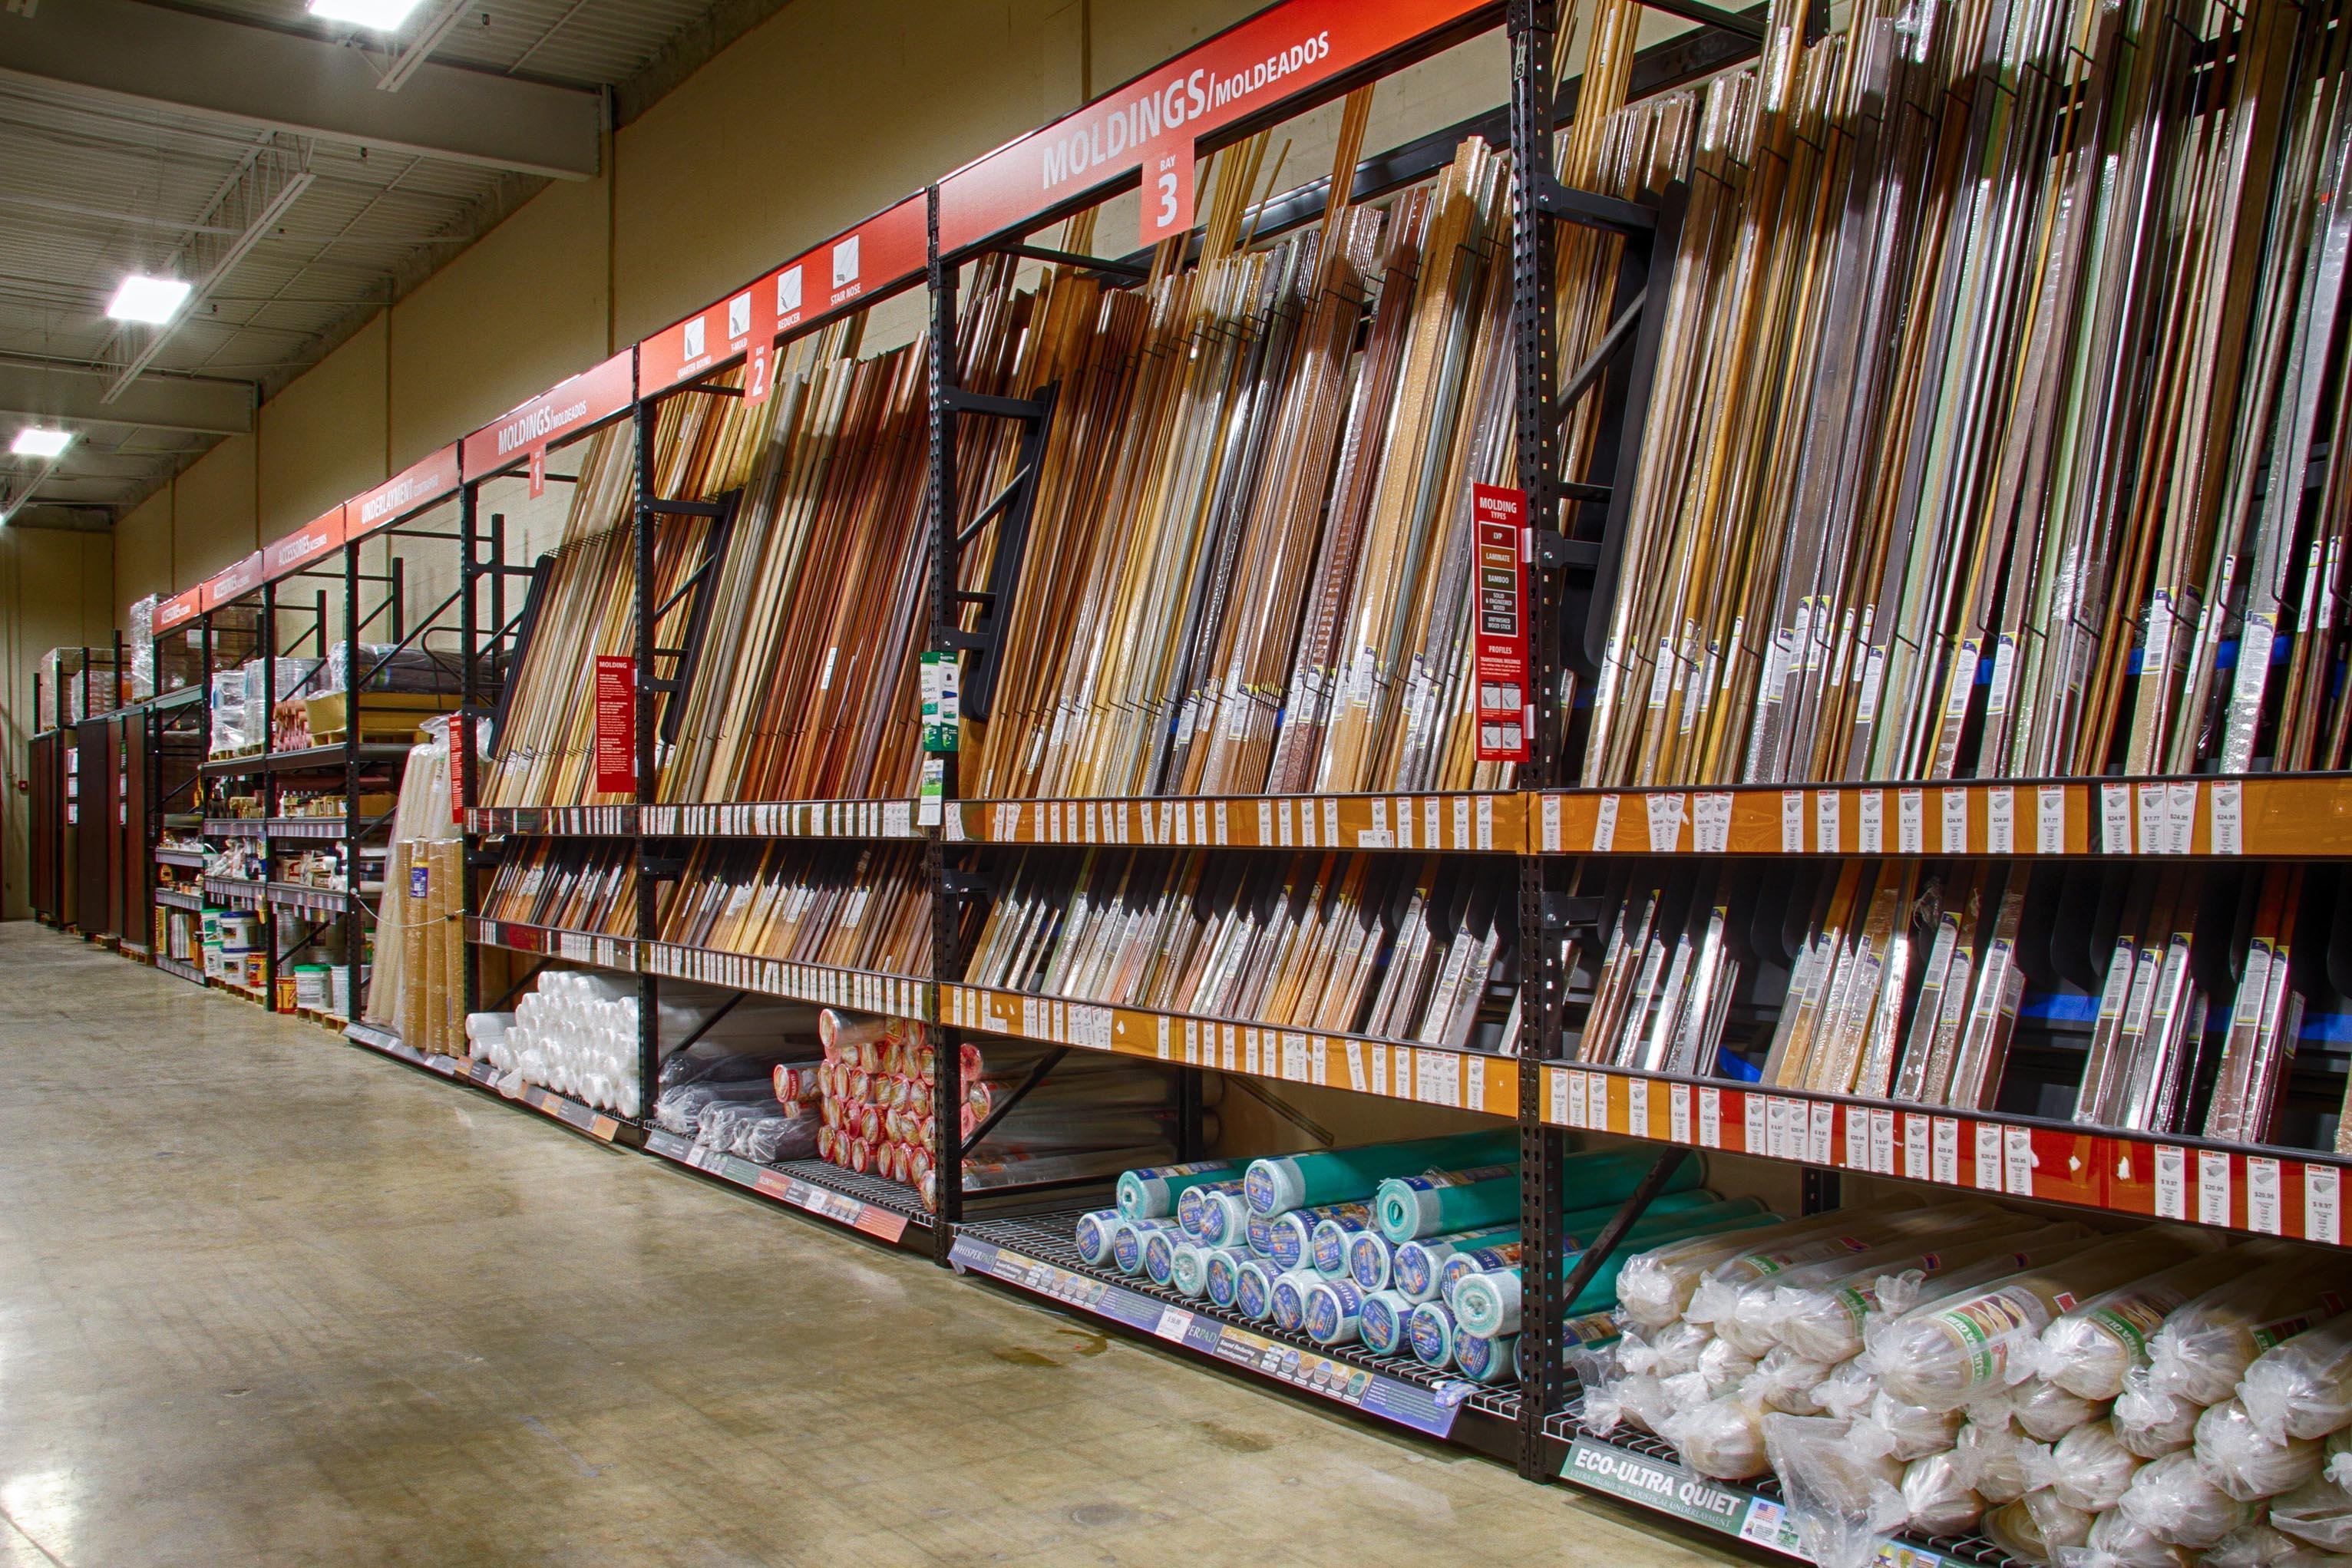 Floor & Decor, Gaithersburg Maryland (MD) - LocalDatabase.com